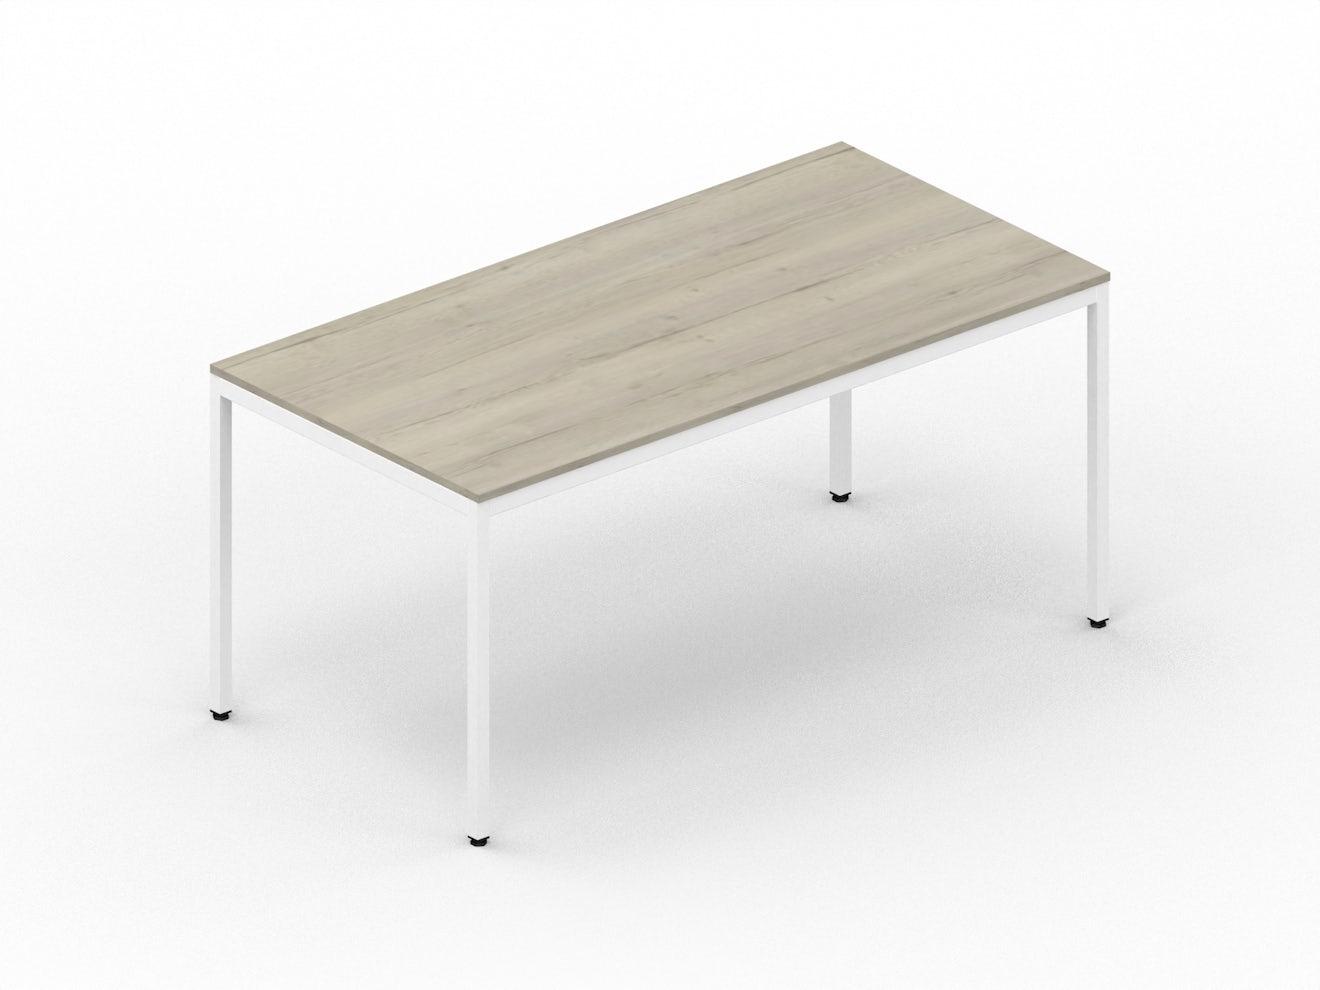 Rechthoekige multifunctionele tafel DECO